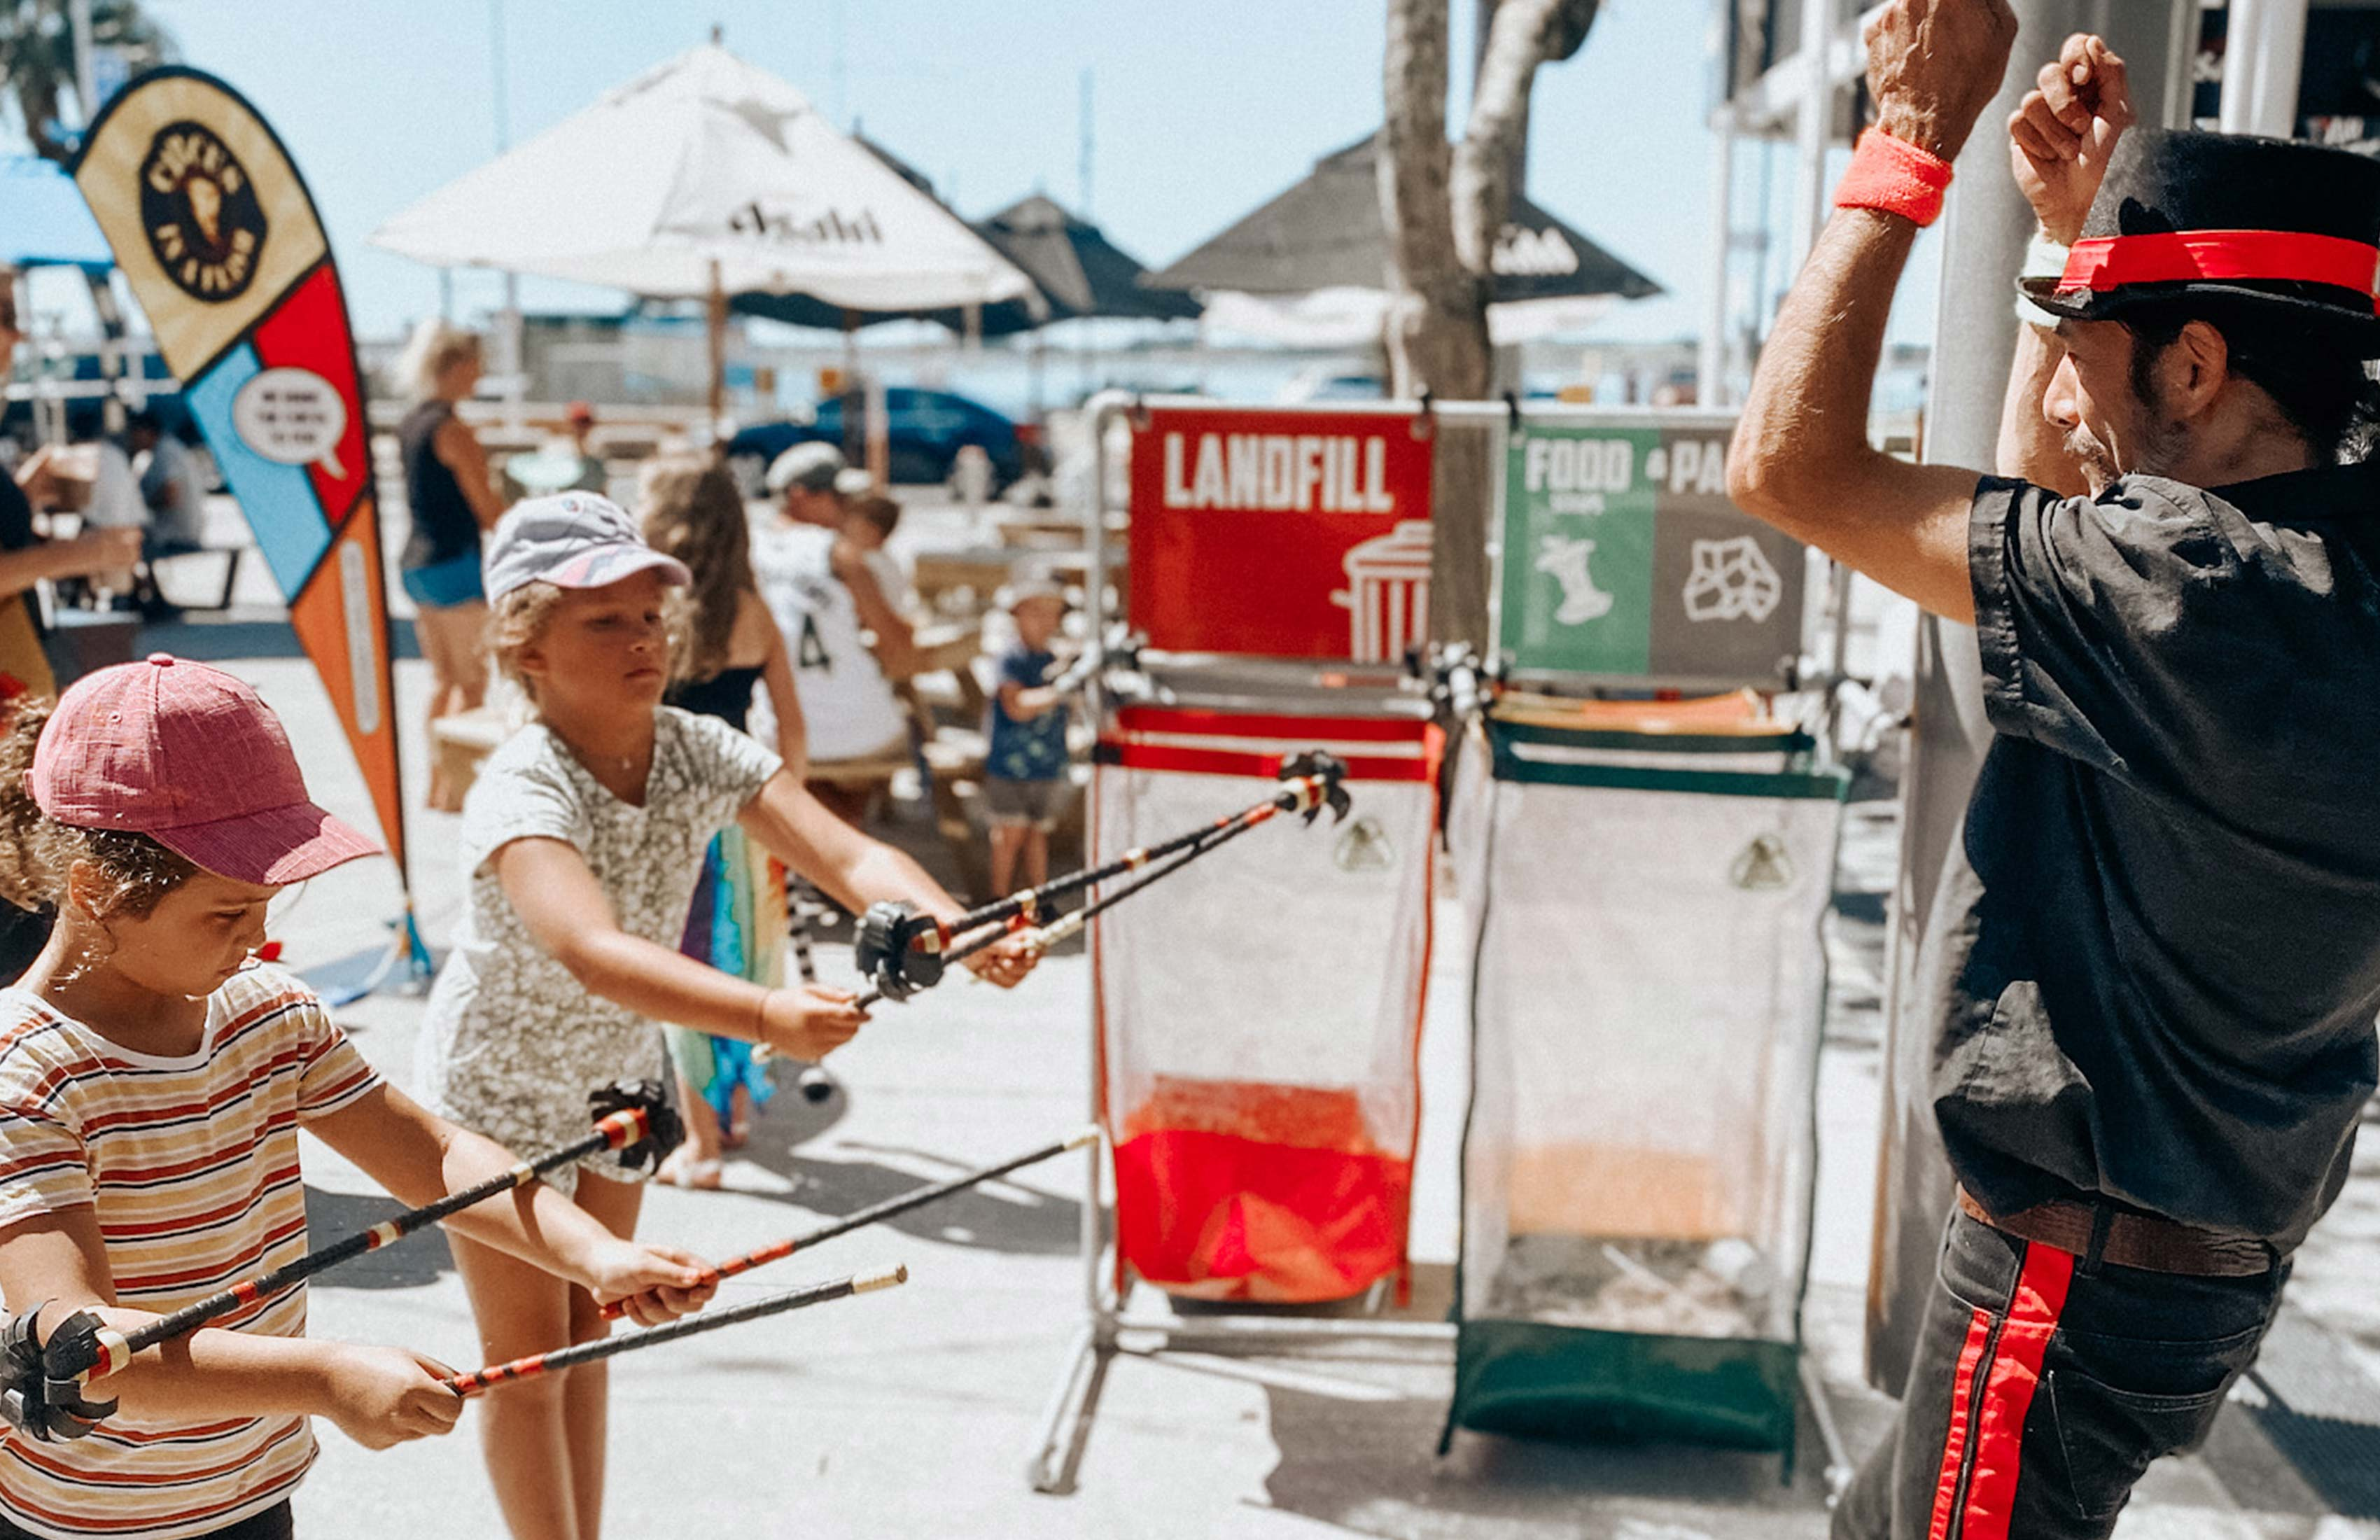 Children learn circus skills on Warf Street